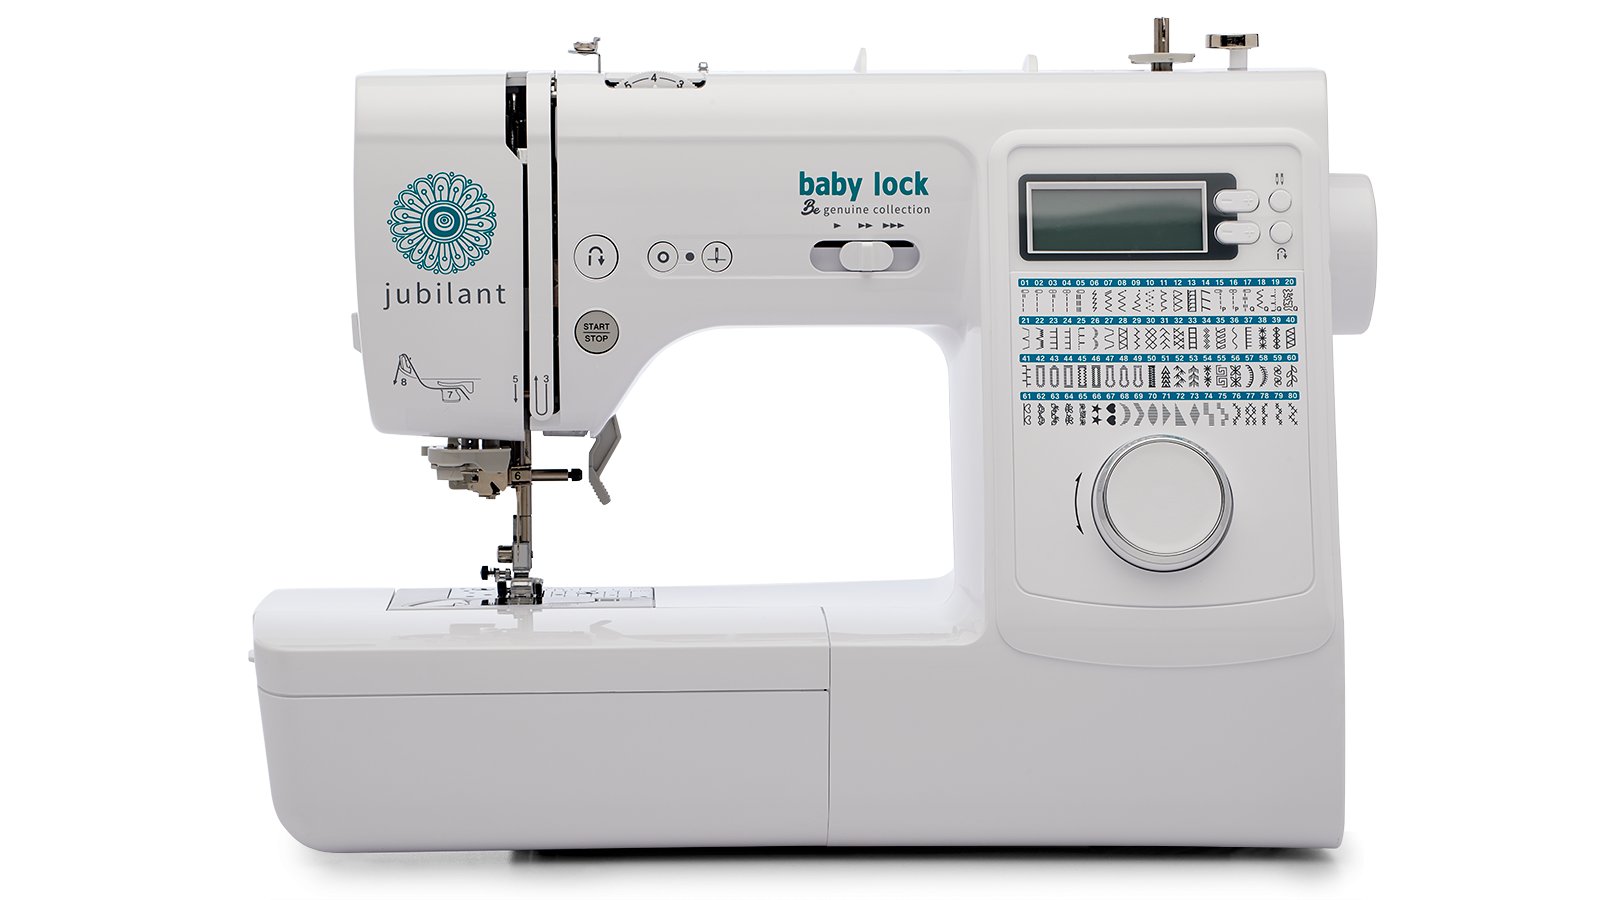 Baby Lock Jubilant (Genuine Collection)